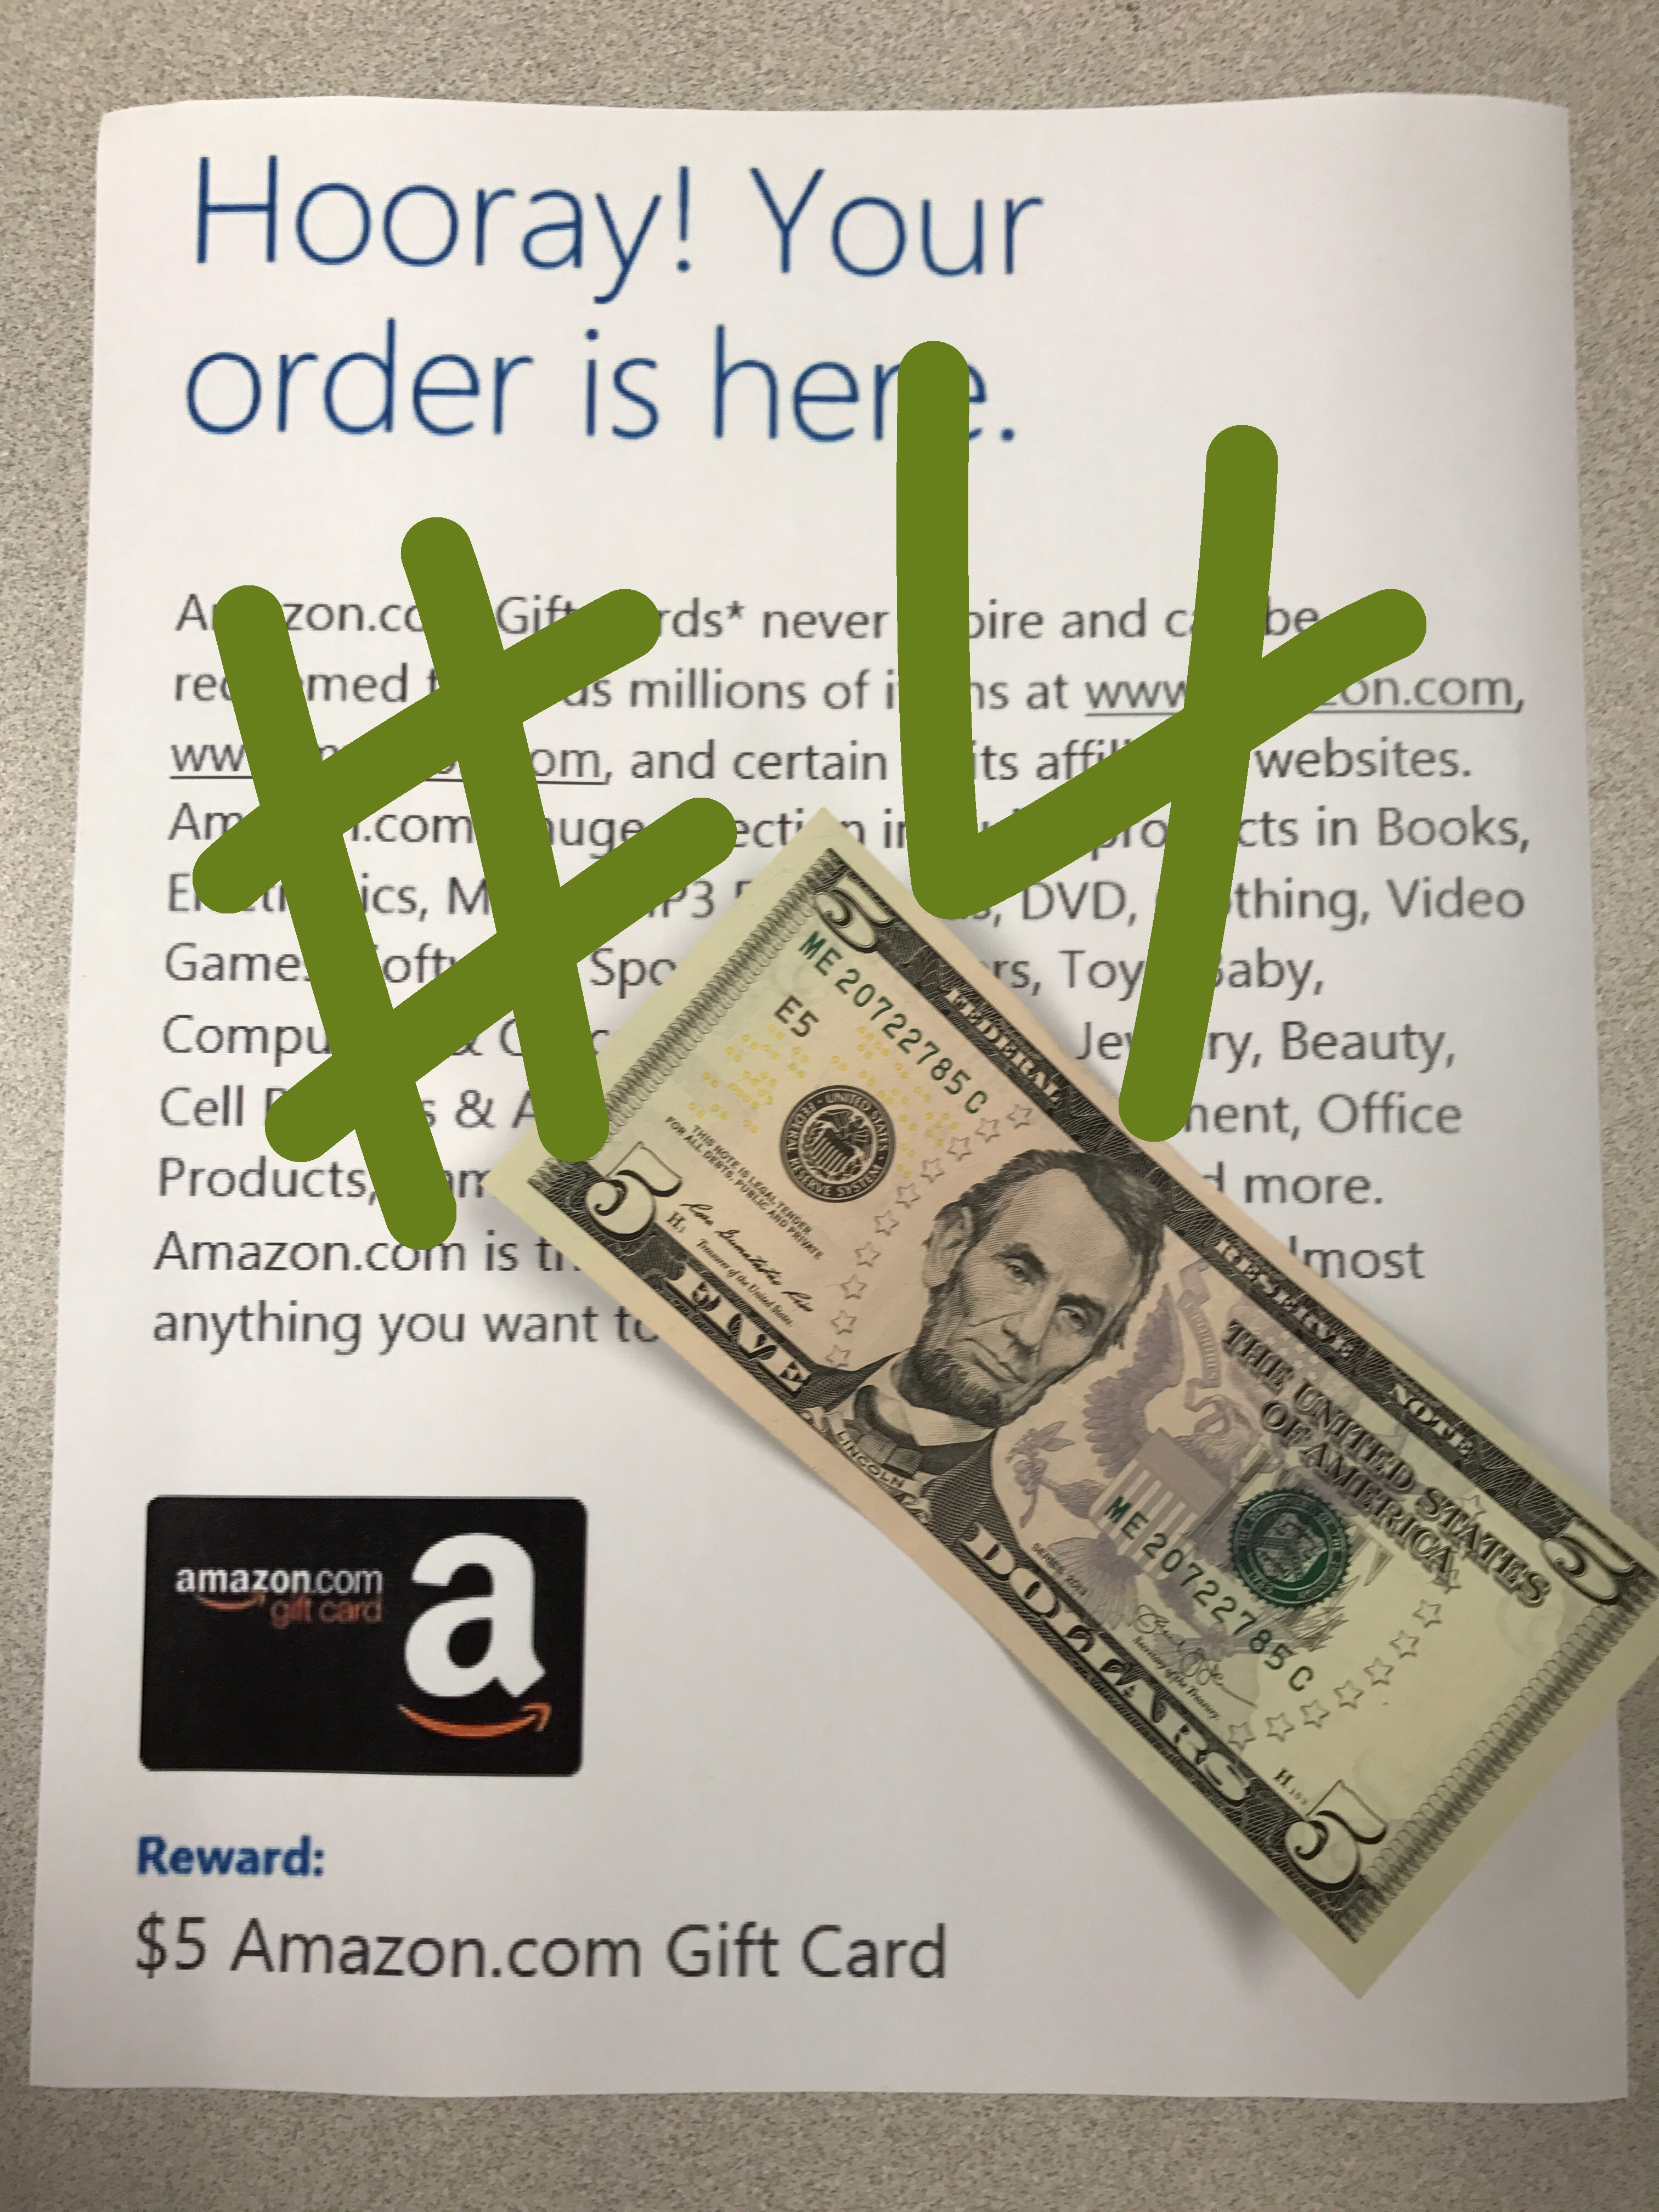 microsoft reward points  u2013  5 amazon gift card  4  u2014 dave gates